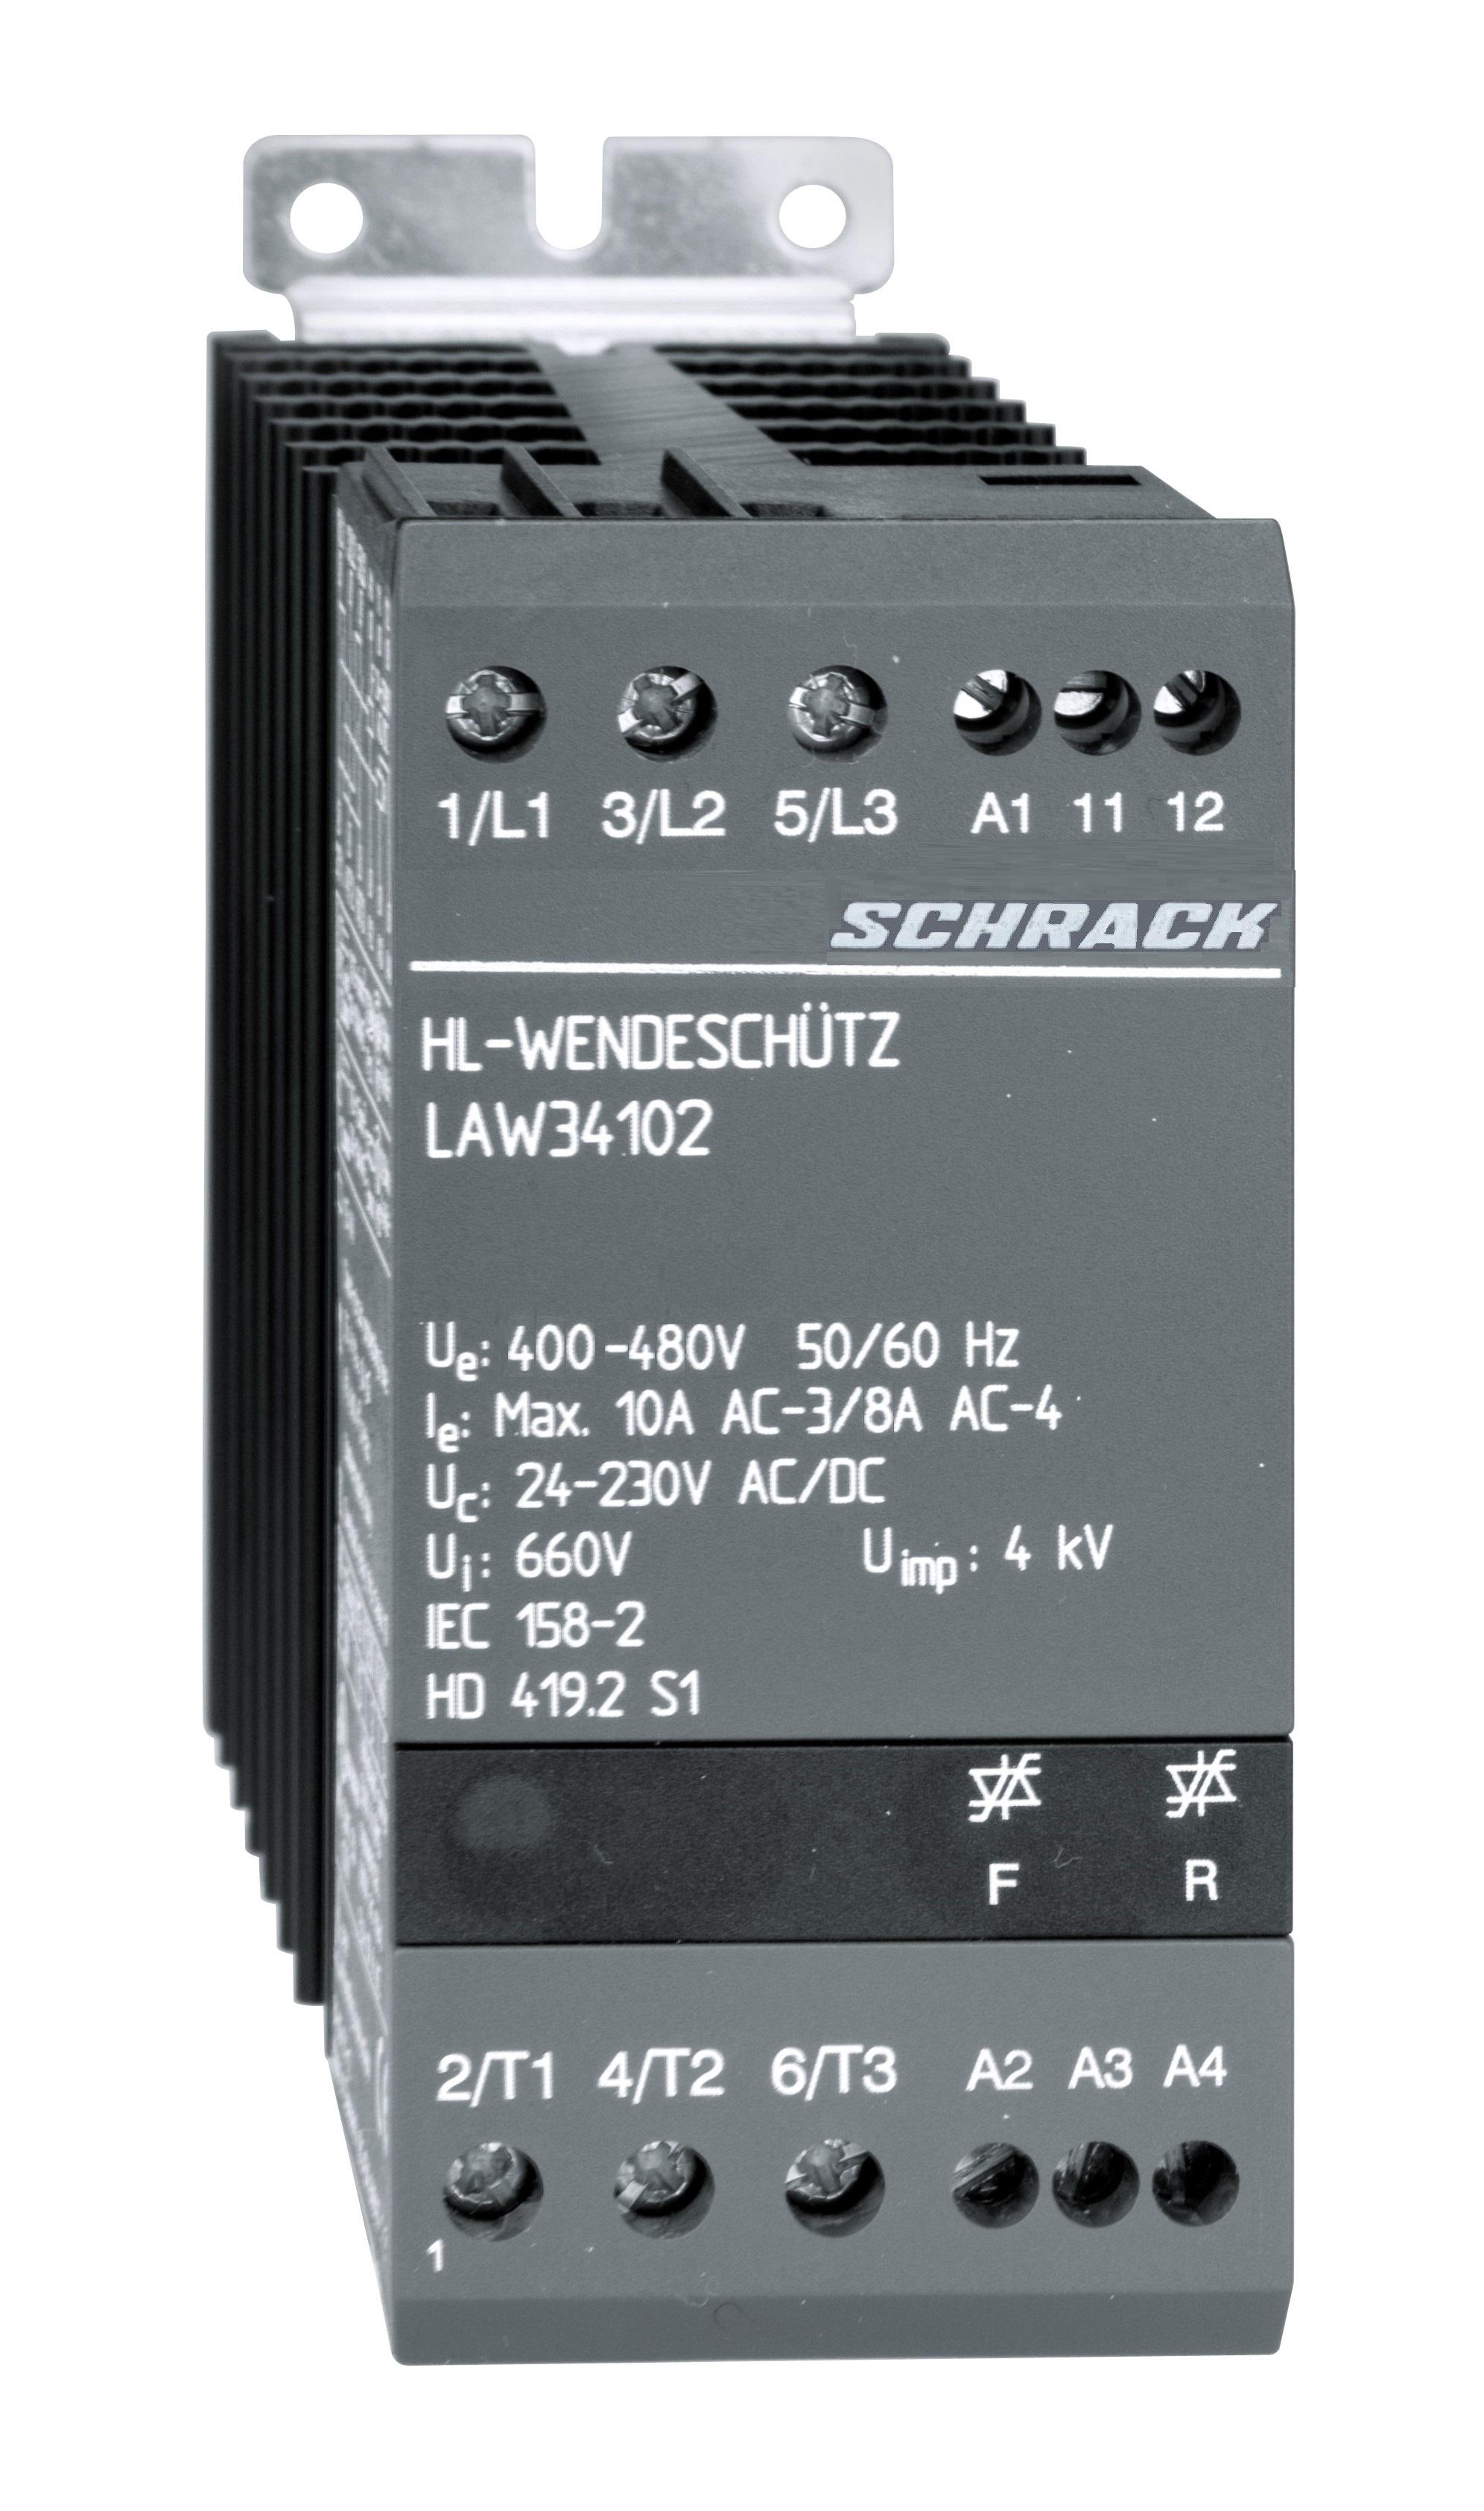 1 Stk Halbleiter-Wendeschütz 3polig 10A/24-480VAC/DC LAW34102--